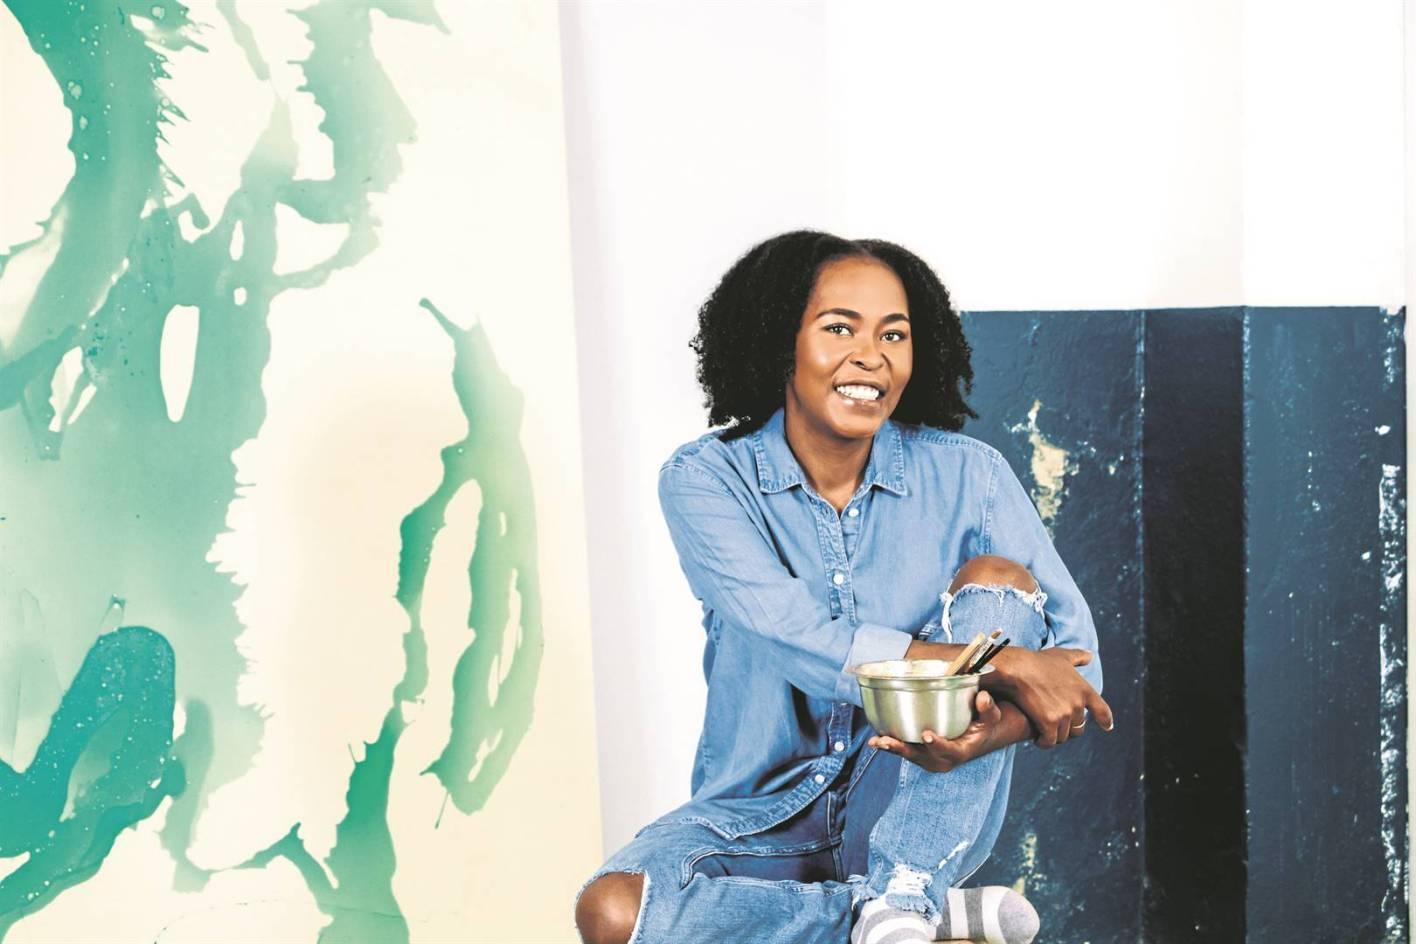 Visual artist Buhlebezwe Siwani on cloud nine